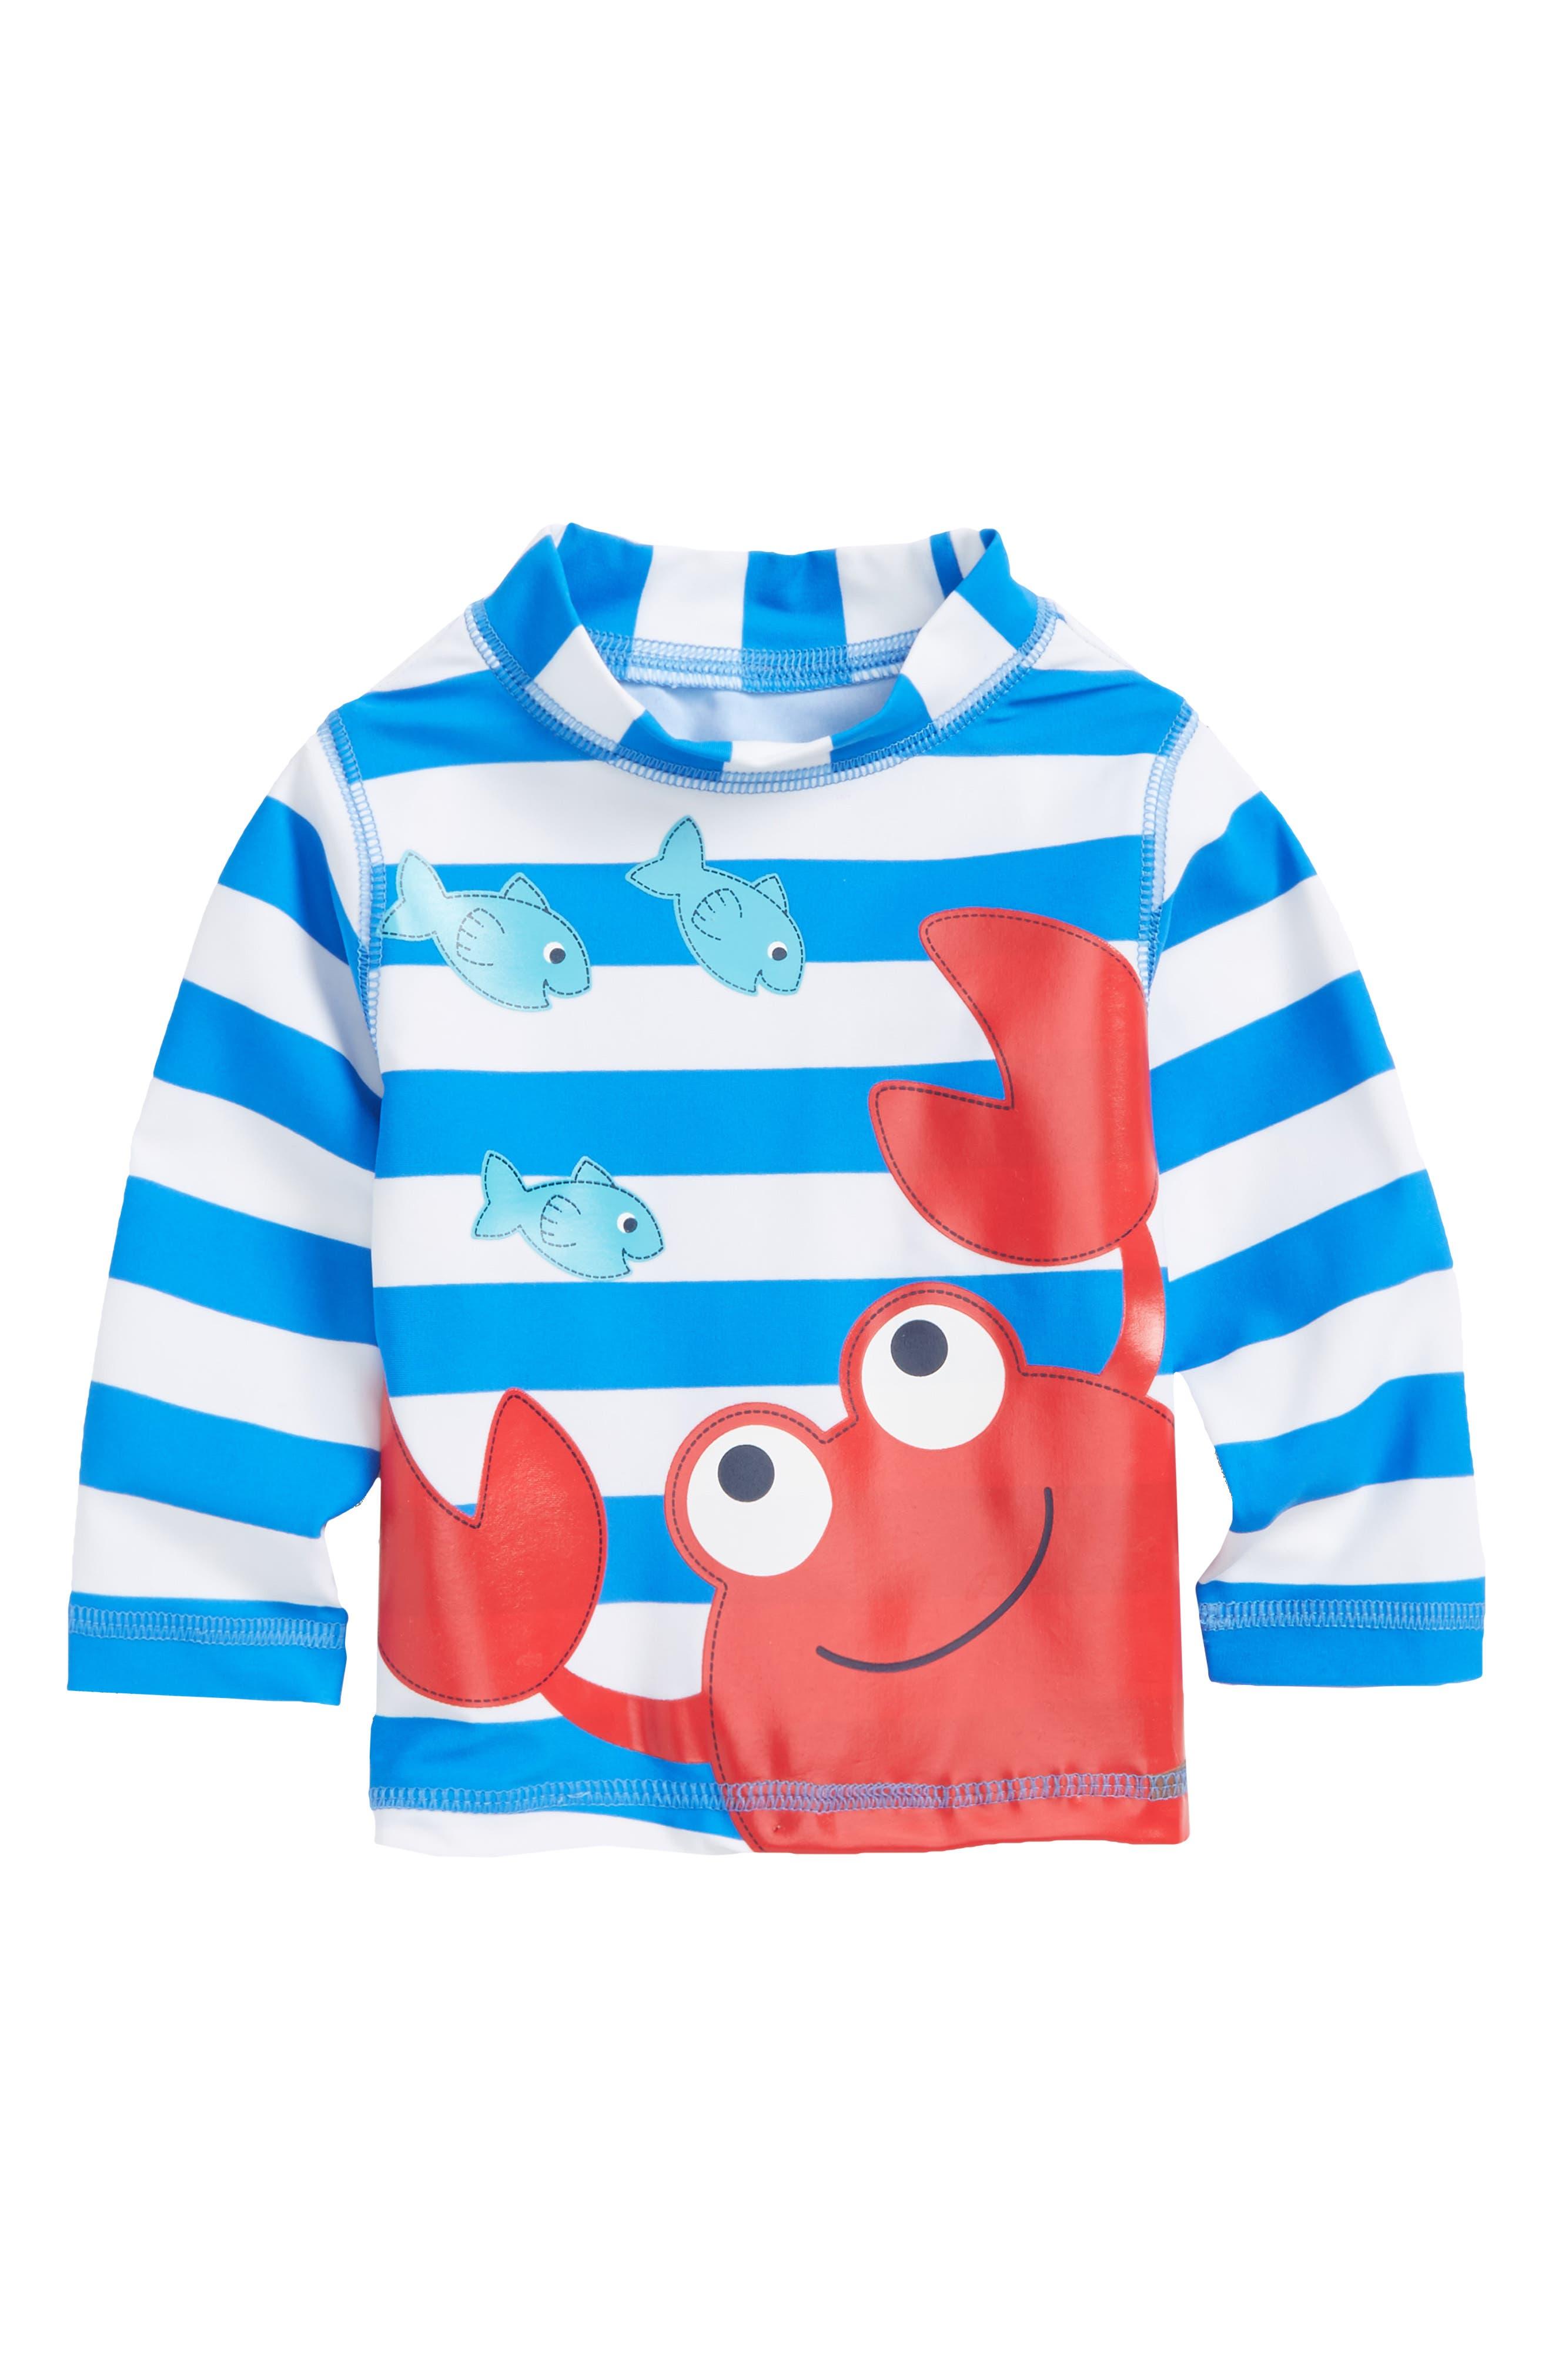 Alternate Image 1 Selected - Little Me Crab UPF 50+ Rashguard (Baby Boys)